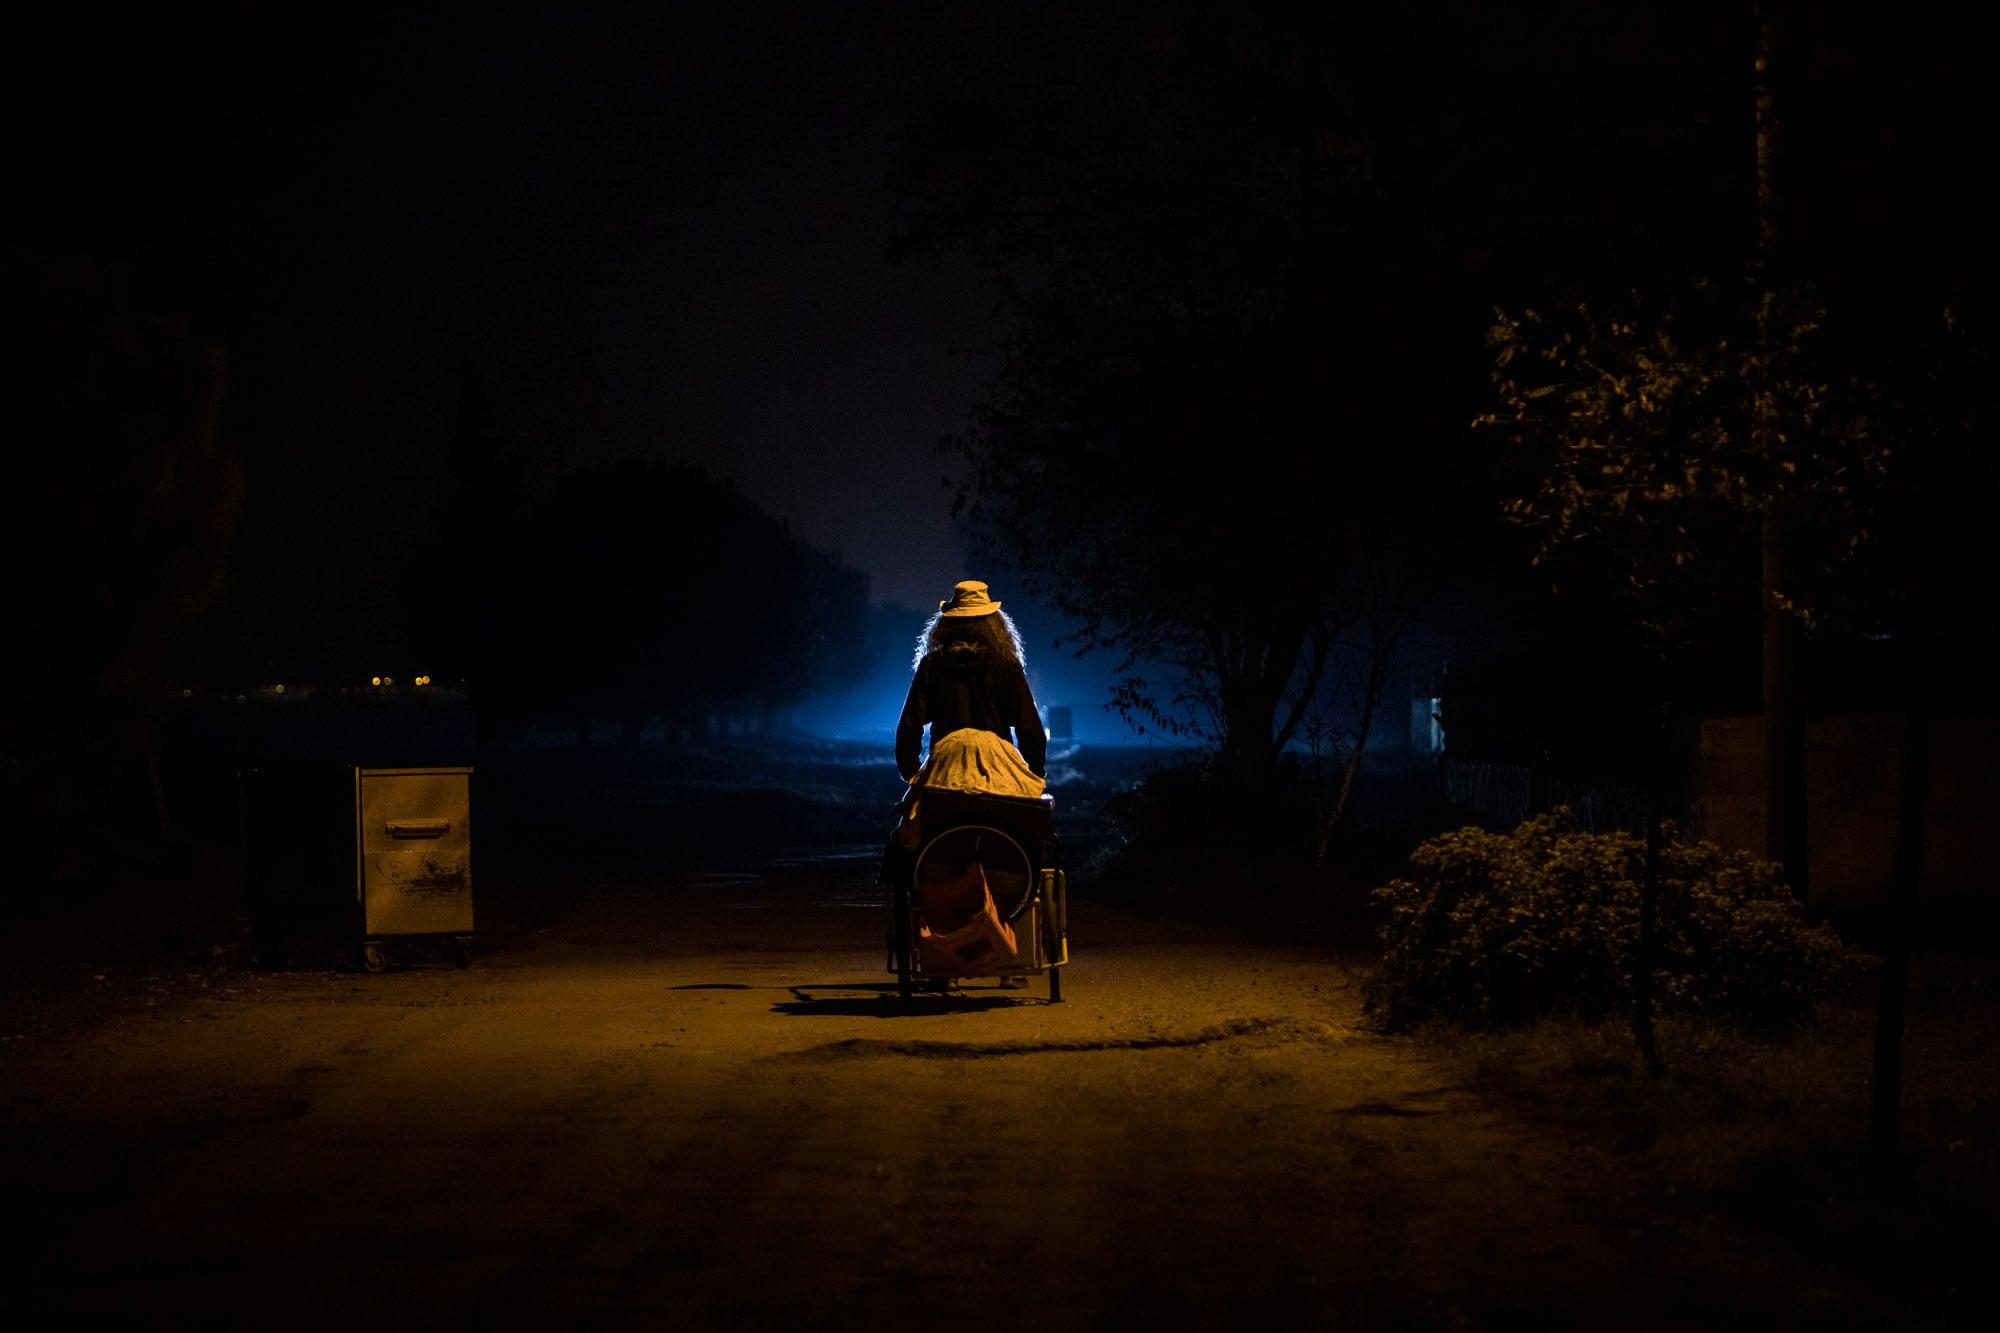 walking near Yesilyurt at night